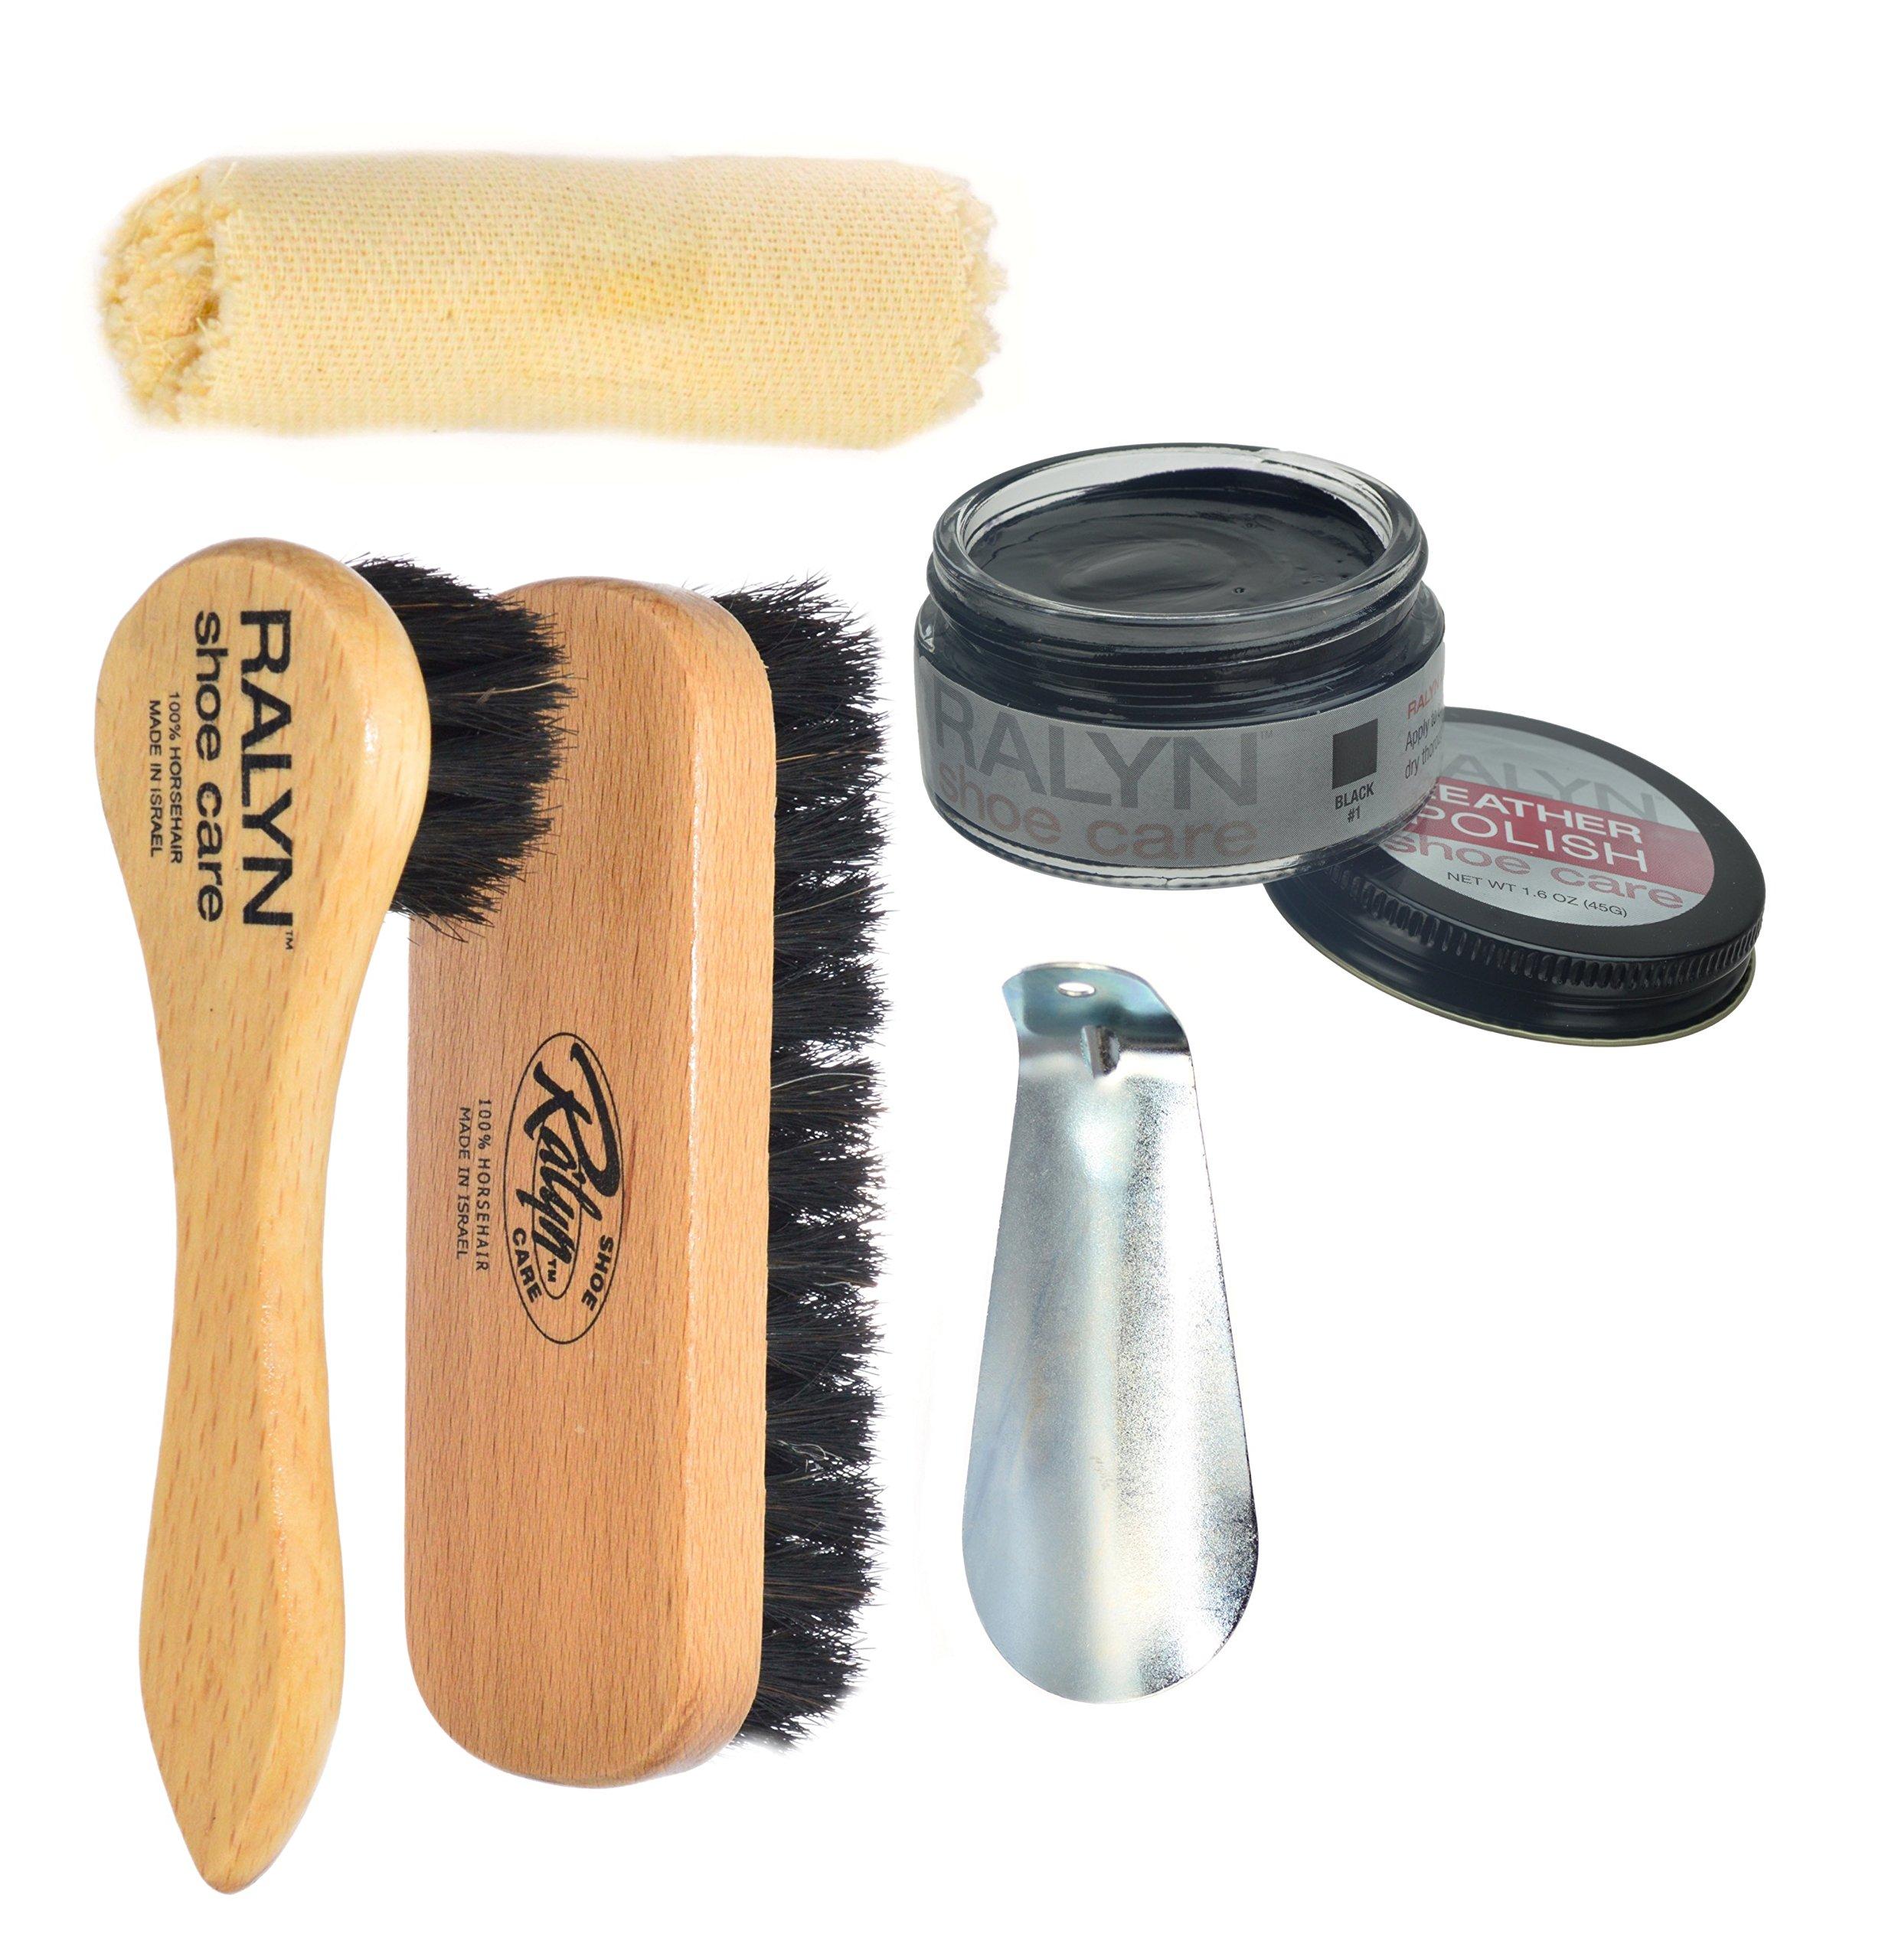 Ralyn Travel Shoe Shine Kit. 100% Horsehair Brush & Dauber. Black Leather Cream Polish. & more.